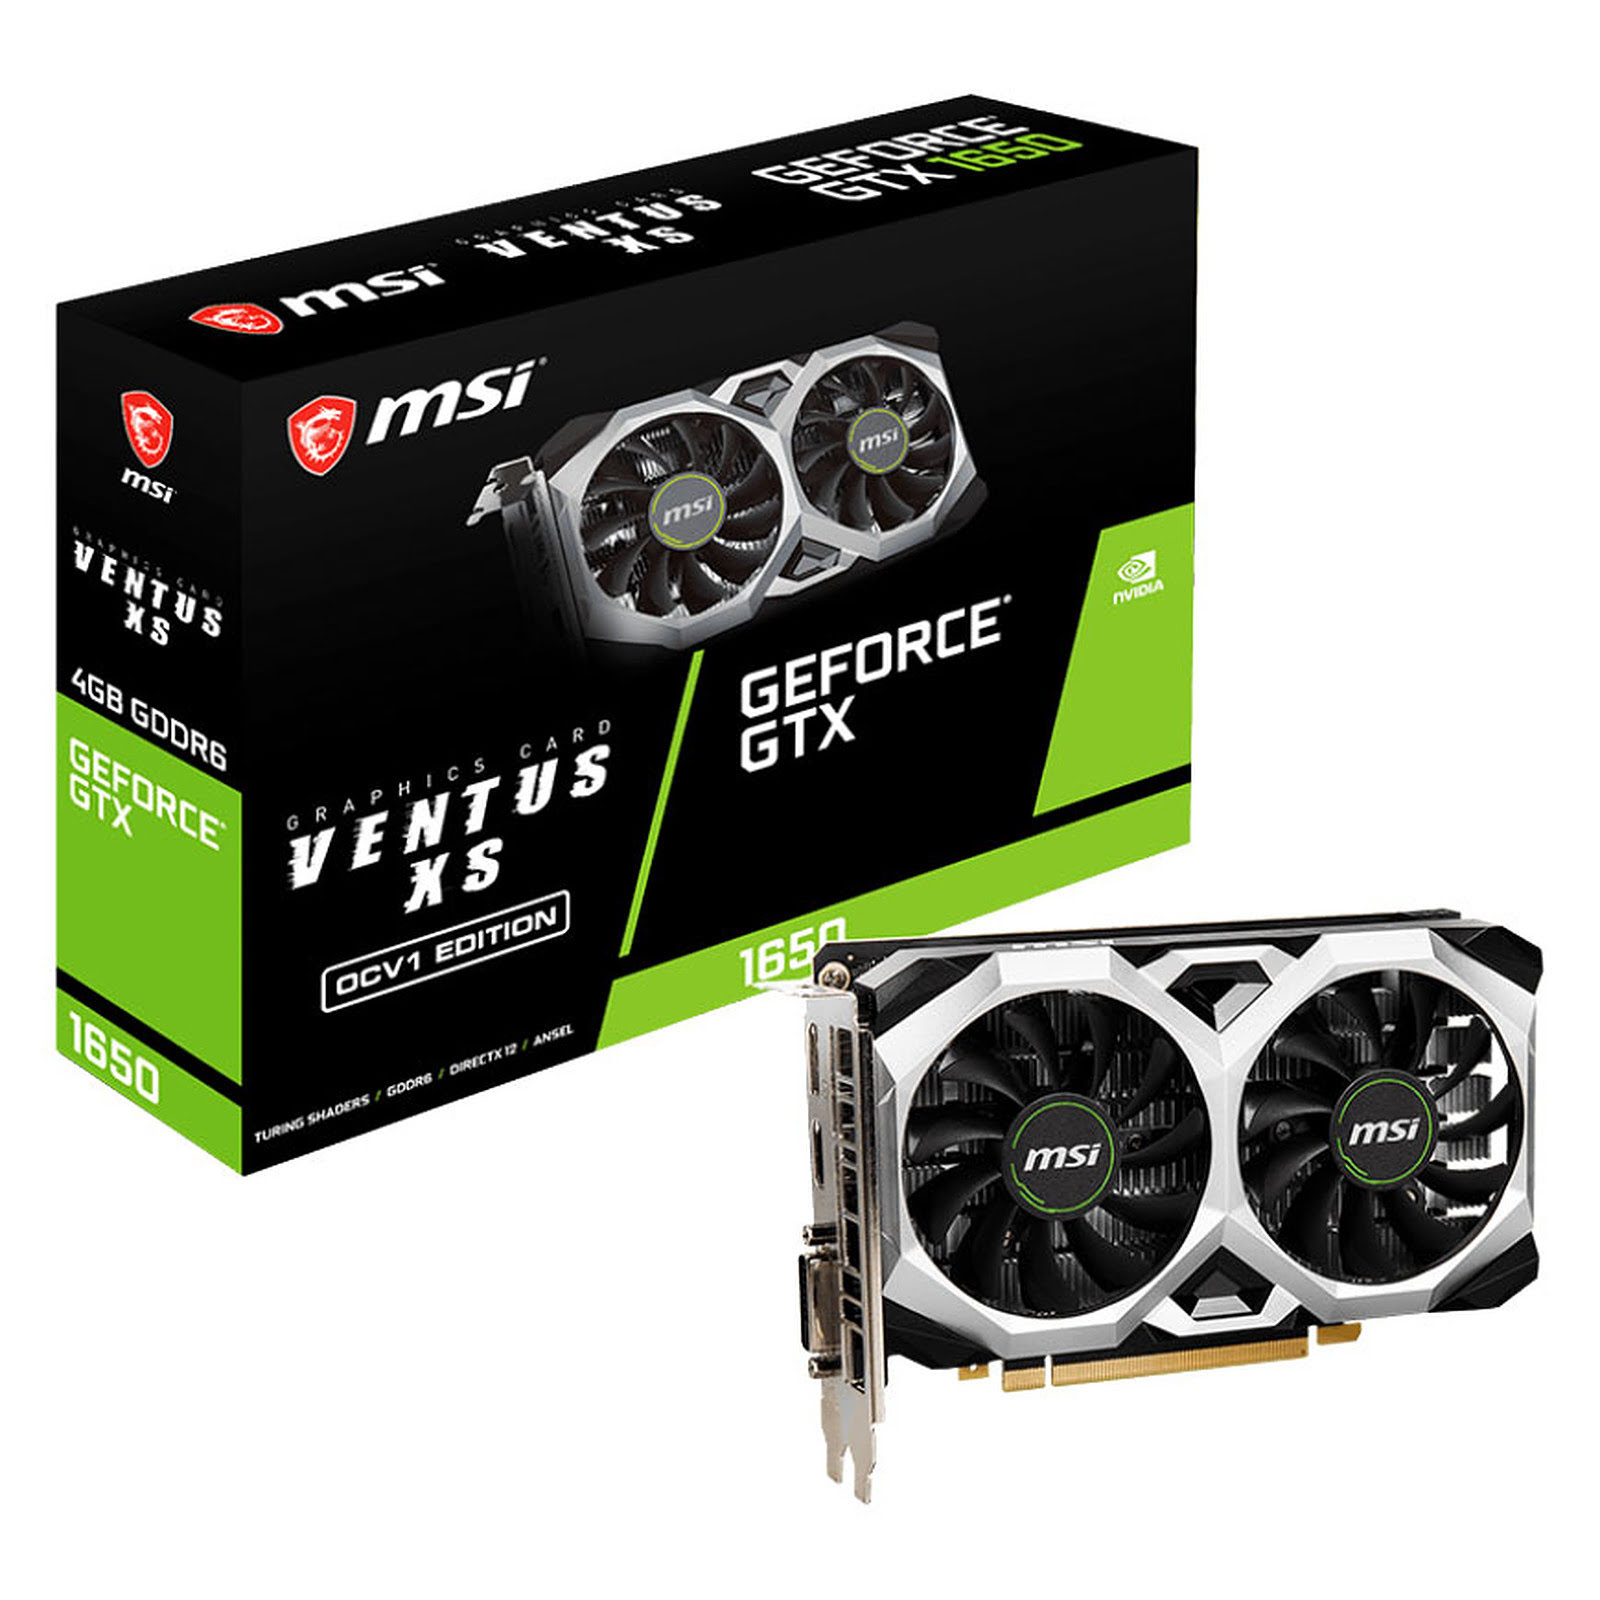 GeForce GTX 1650 D6 VENTUS XS OCV1 (912-V809-3616) - Achat / Vente Carte graphique sur Picata.fr - 0